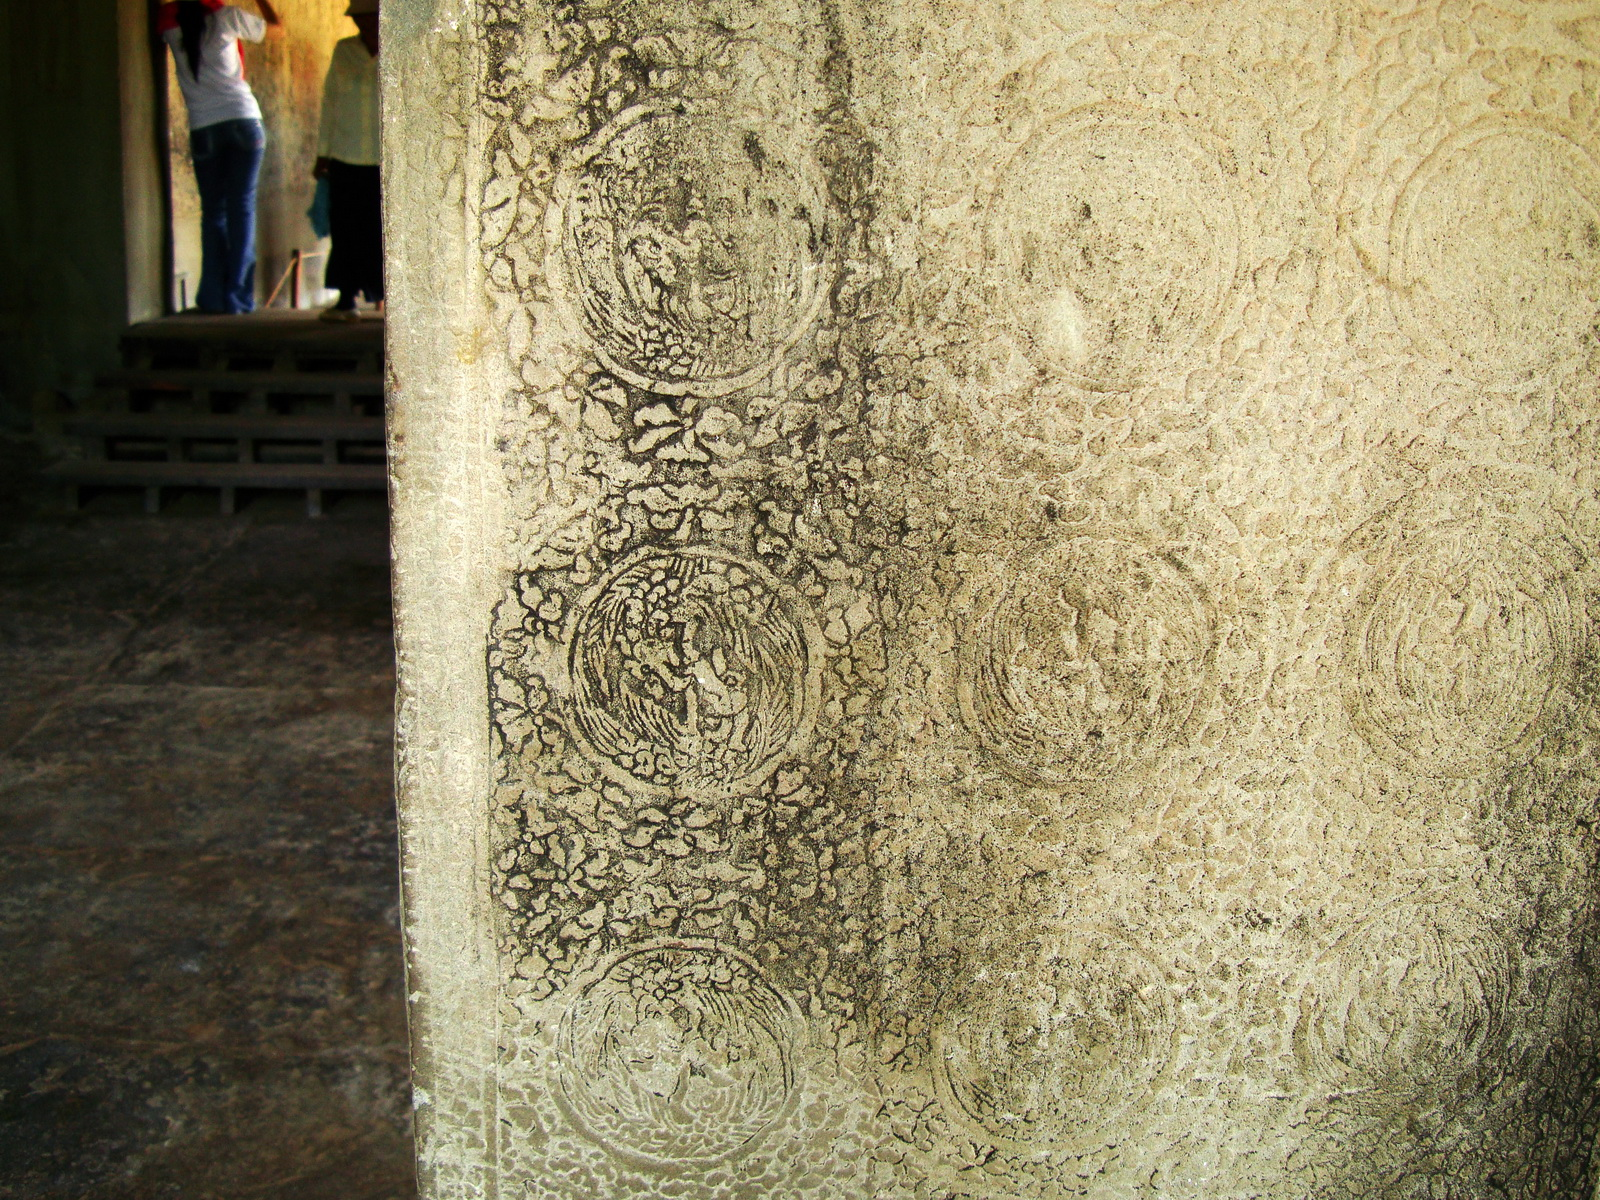 Angkor Wat Bas relief N Gallery W Wing decorative columns 01